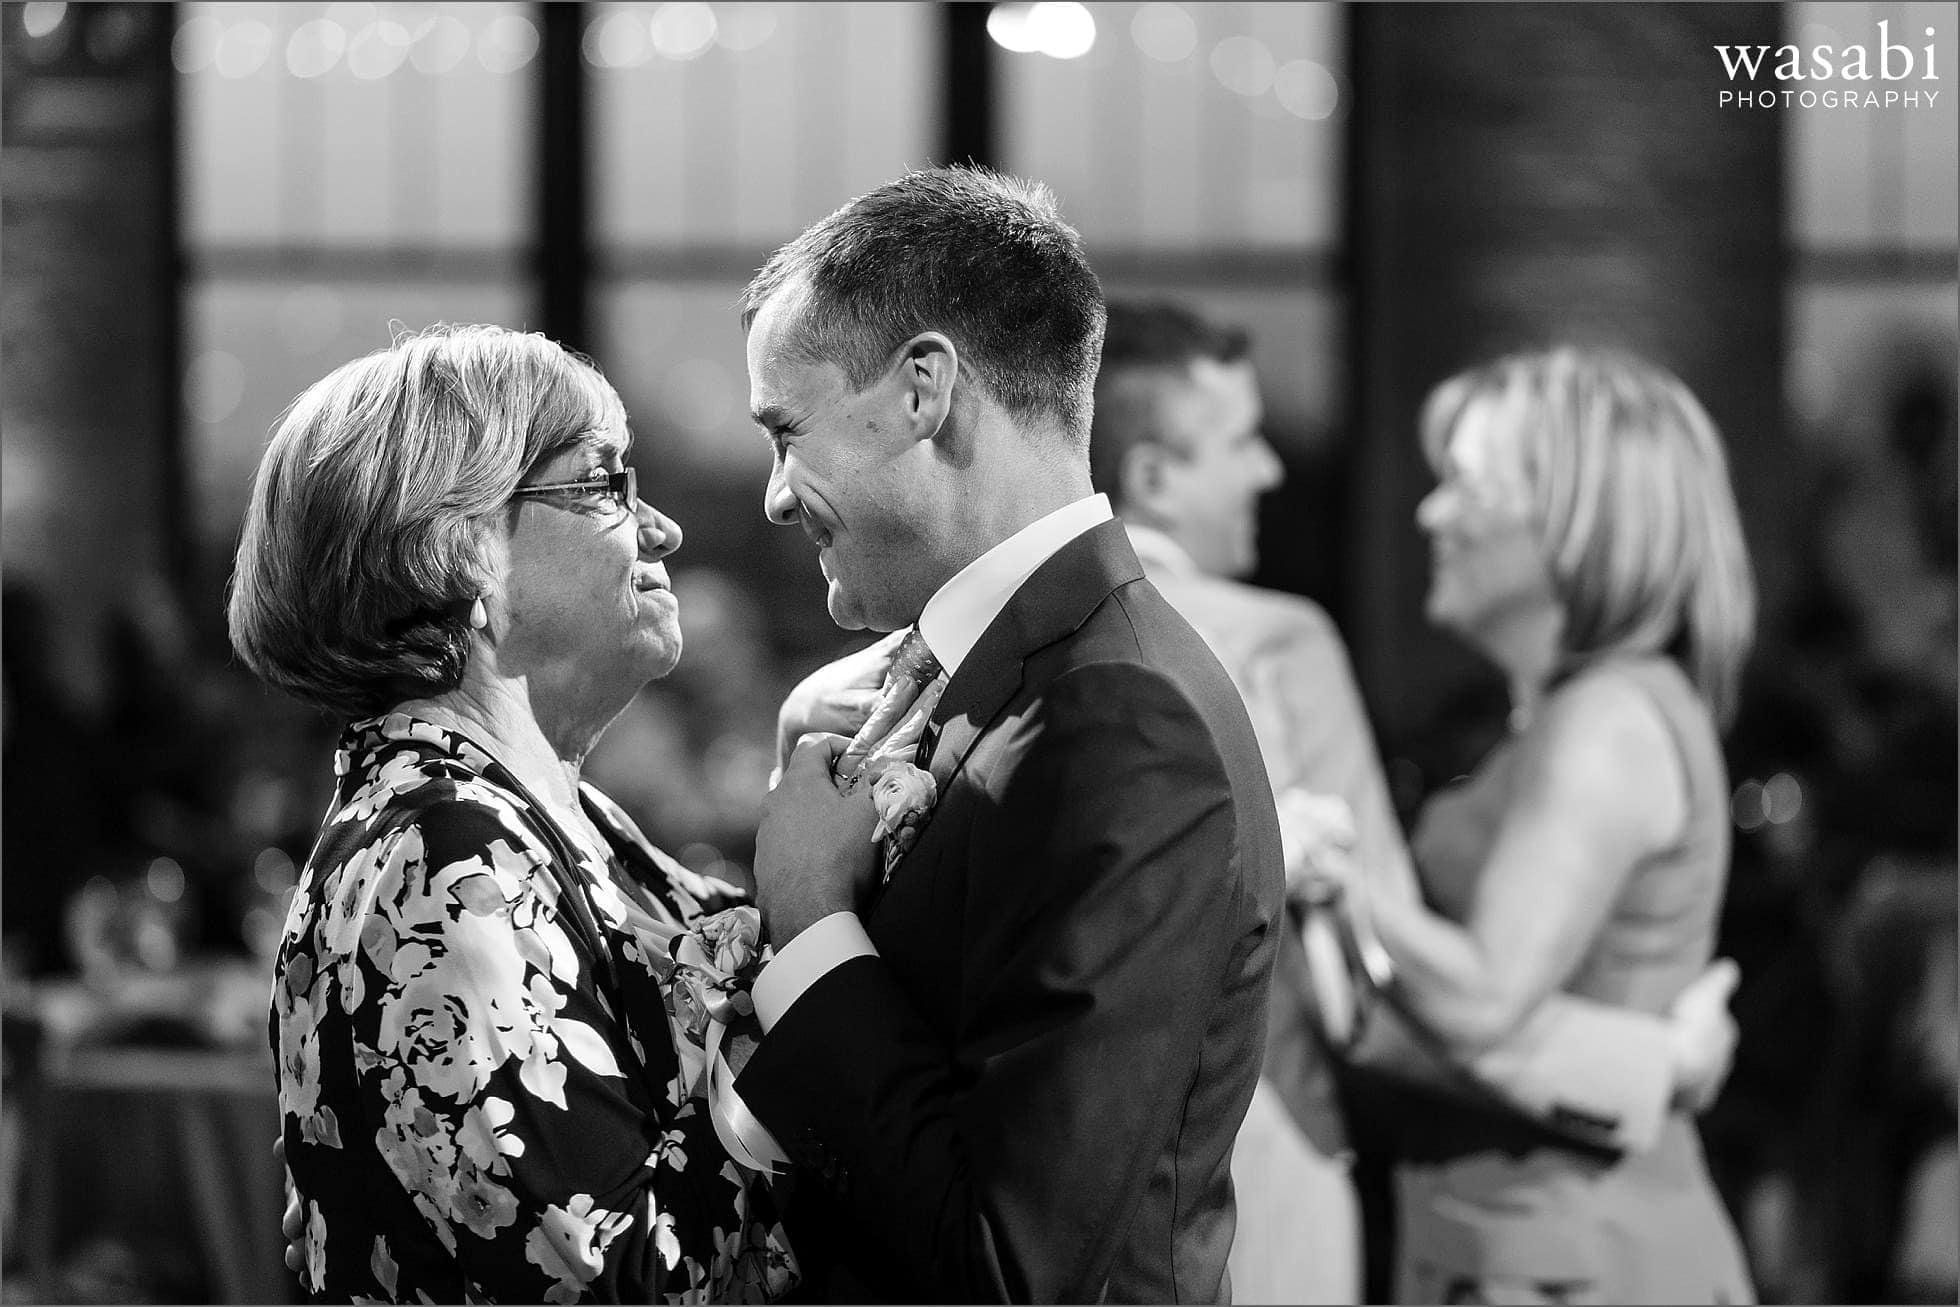 Groom dances with mom at wedding reception